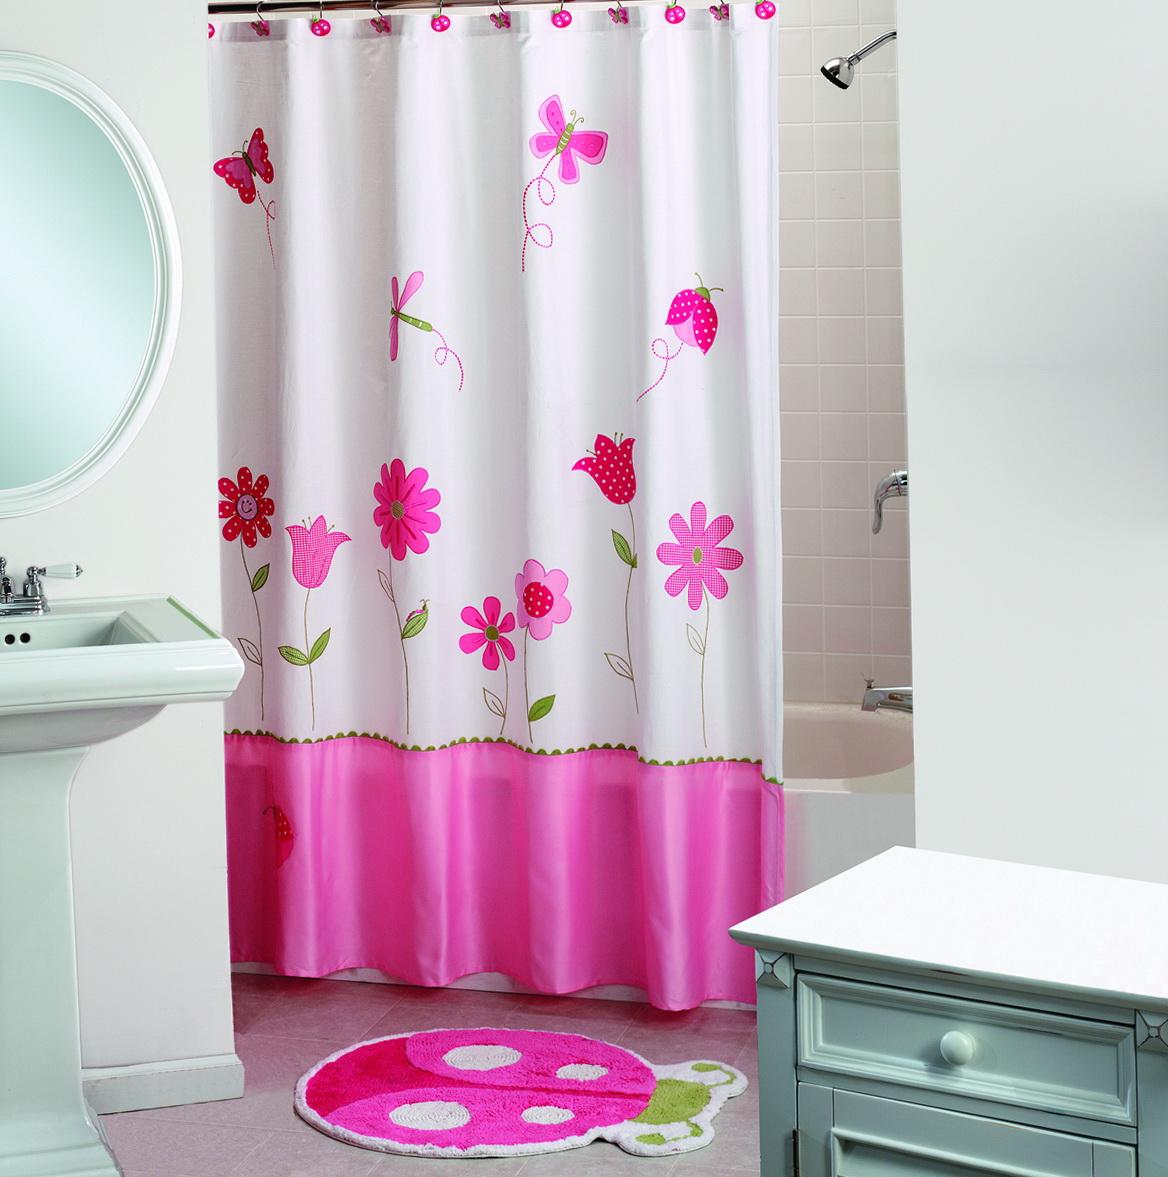 Bath Shower Curtains Sets Home Design Ideas